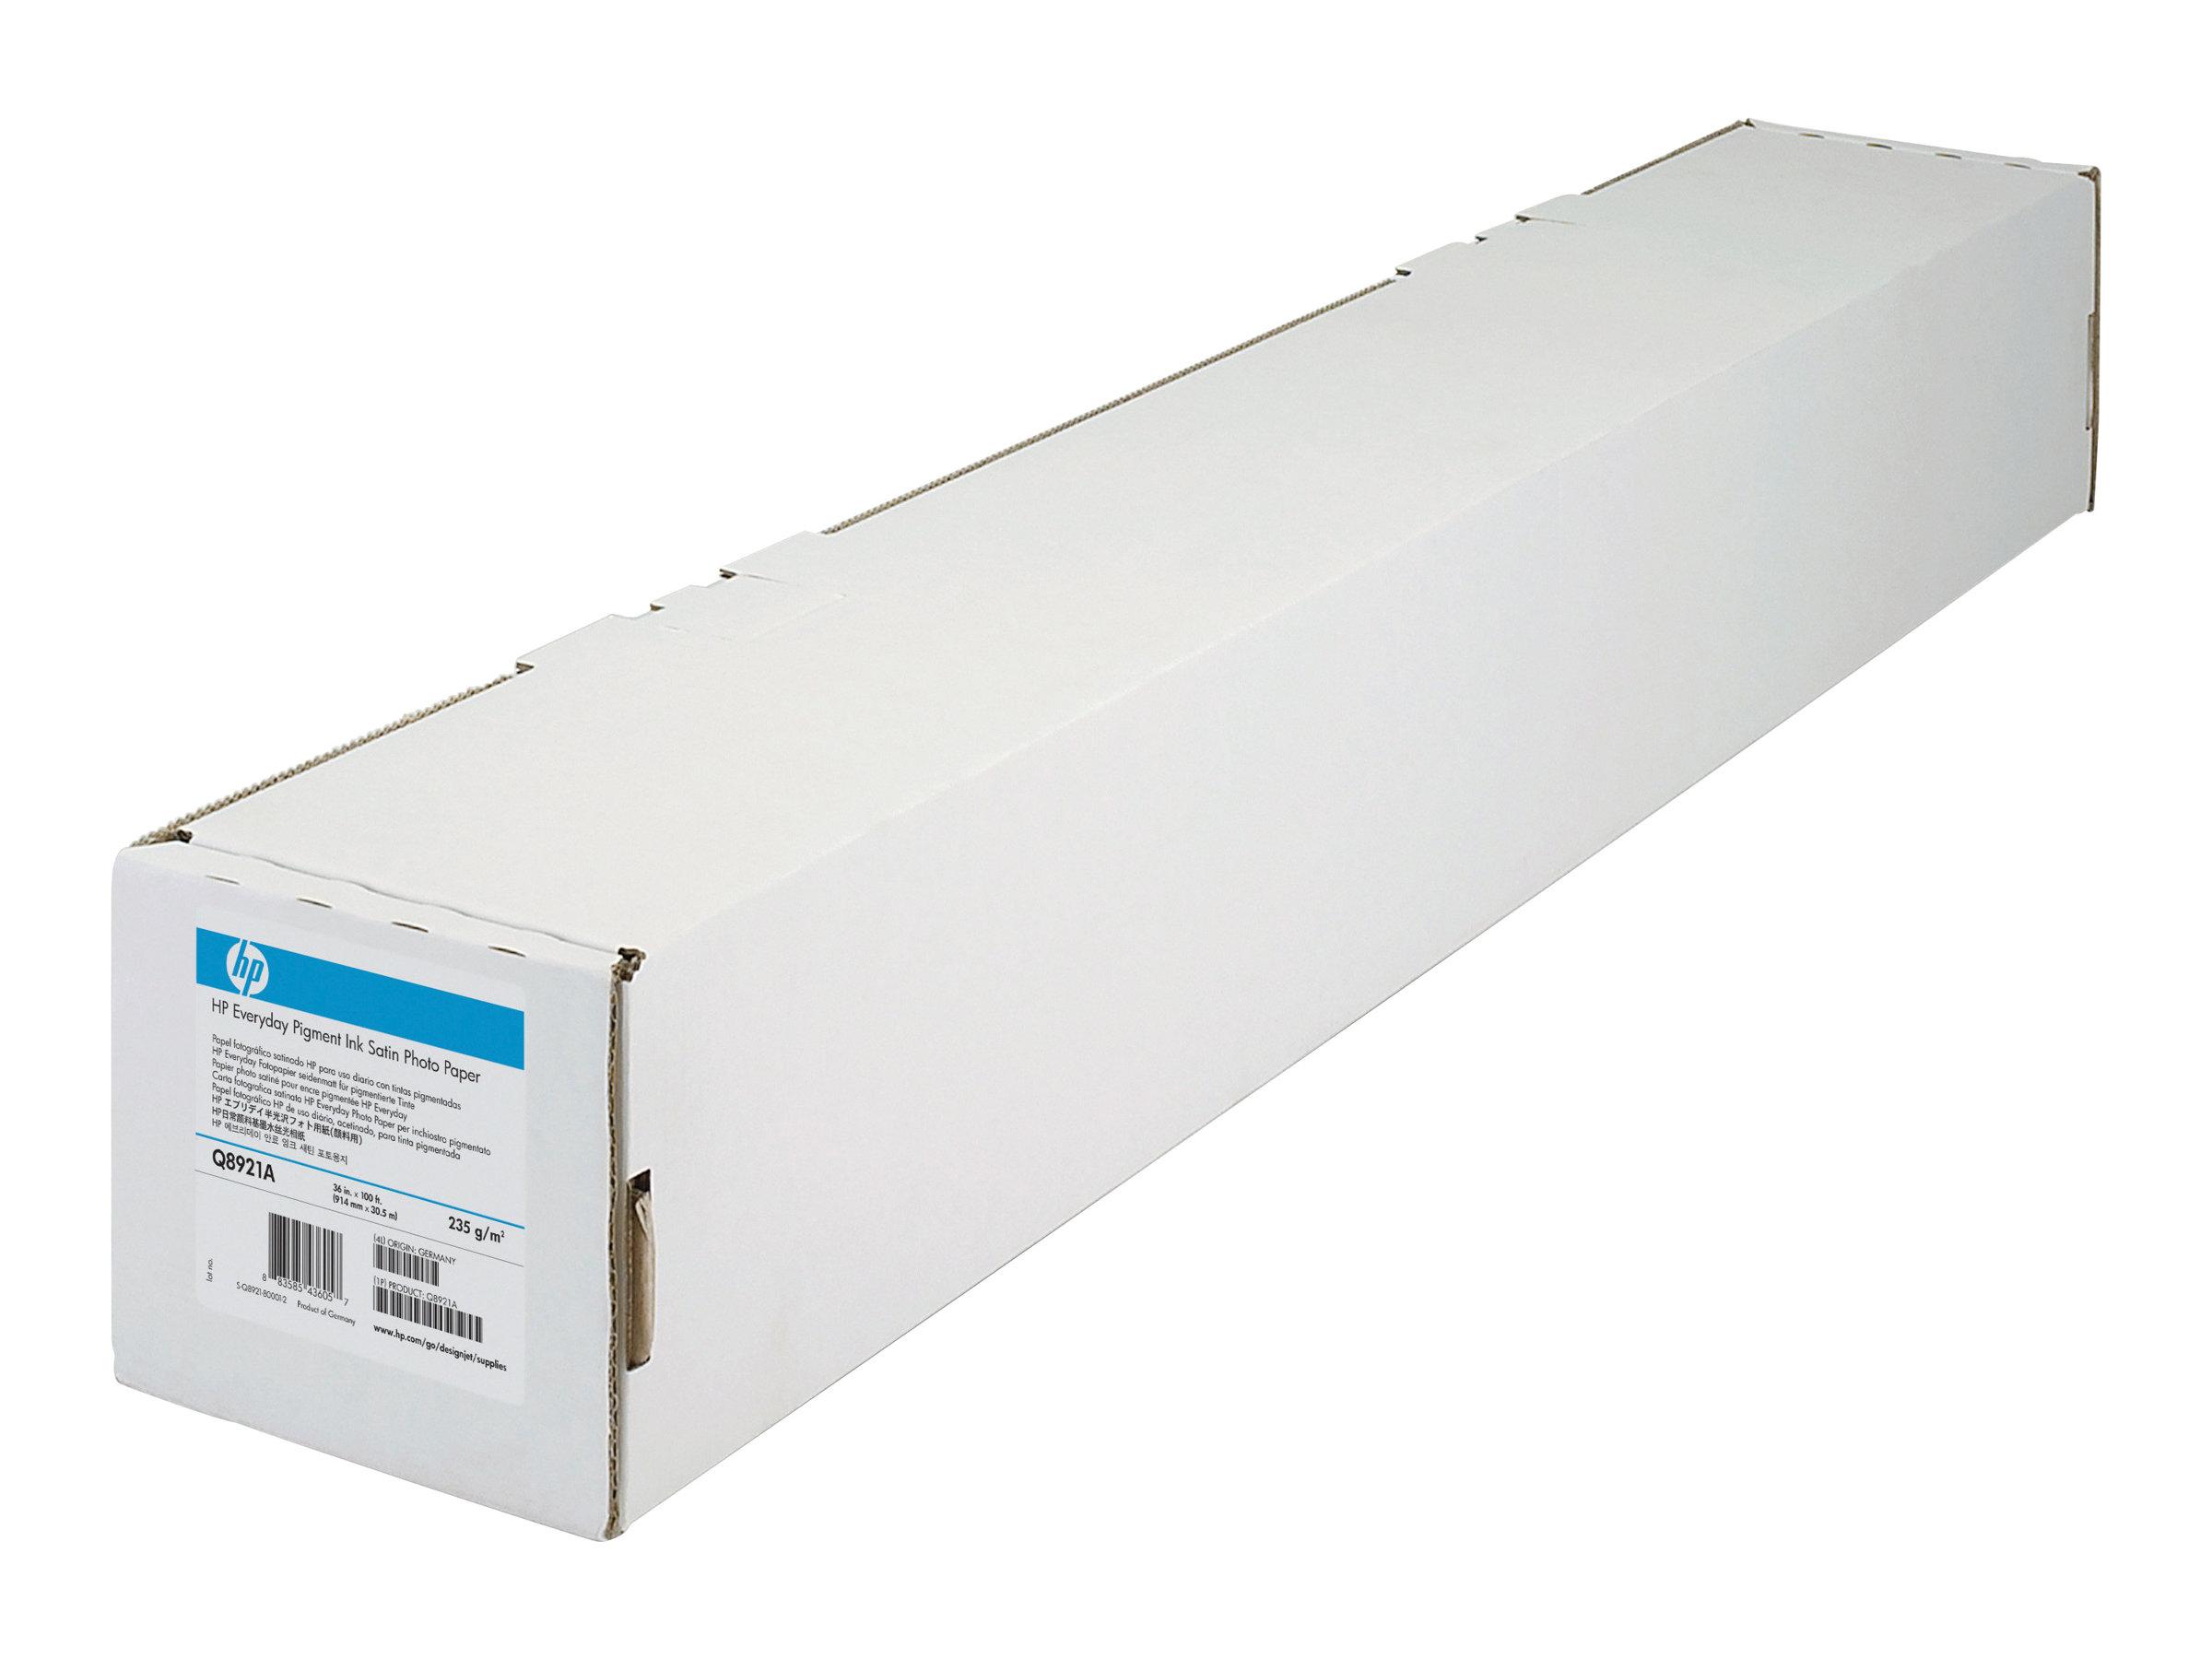 HP Professional Satin Photo Paper - Seidig - 11,4 mil - Rolle (111,8 cm x 15,2 m) 1 Rolle(n) Fotopapier - für DesignJet Z2100, Z